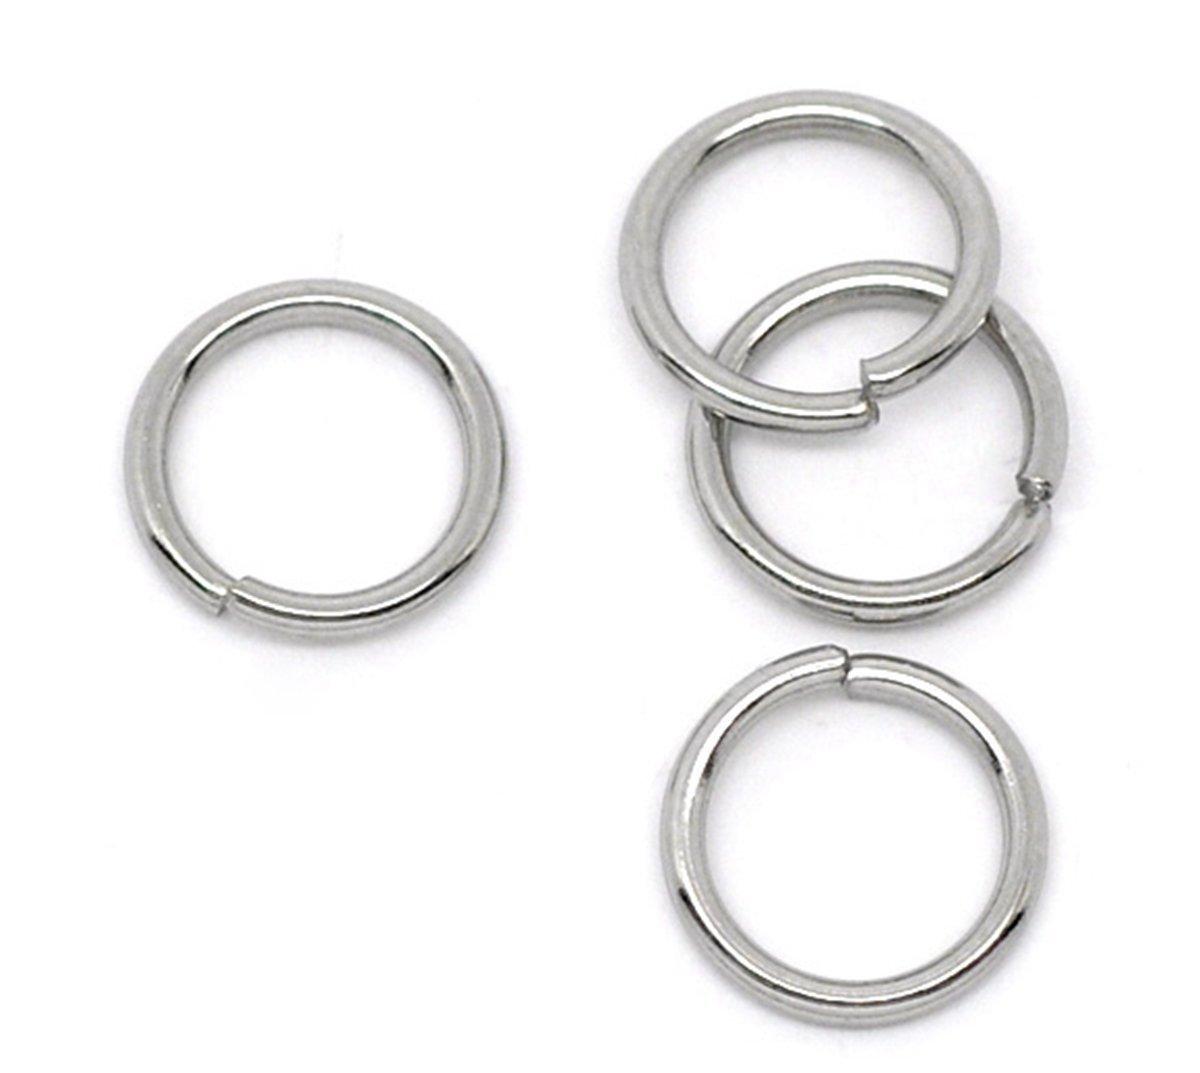 Angel Malone ® 50 x 10mm Stainless Steel Open Jump Rings Jewellery Making Findings